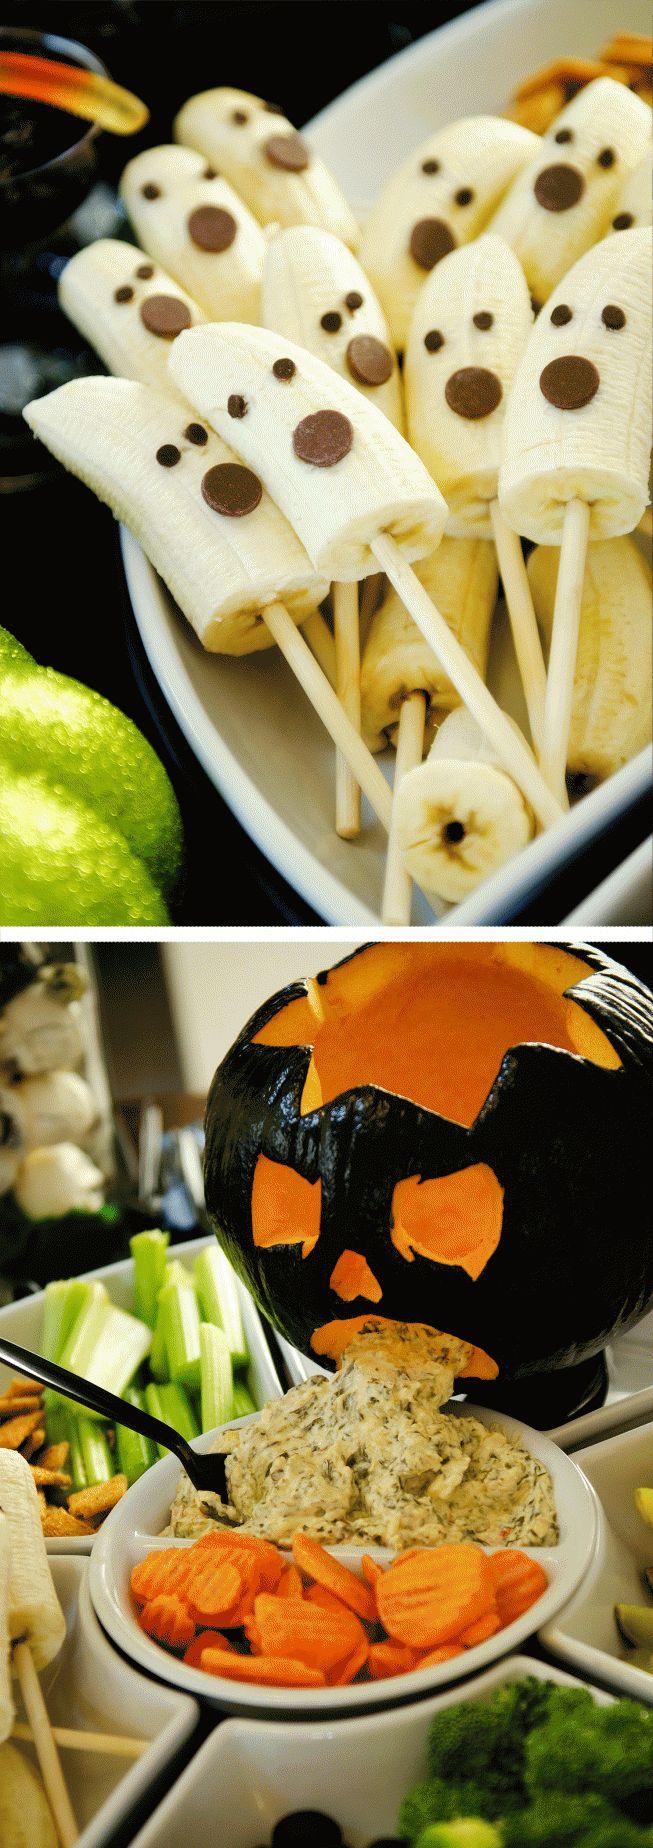 30 best halloween cake ideas images on Pinterest